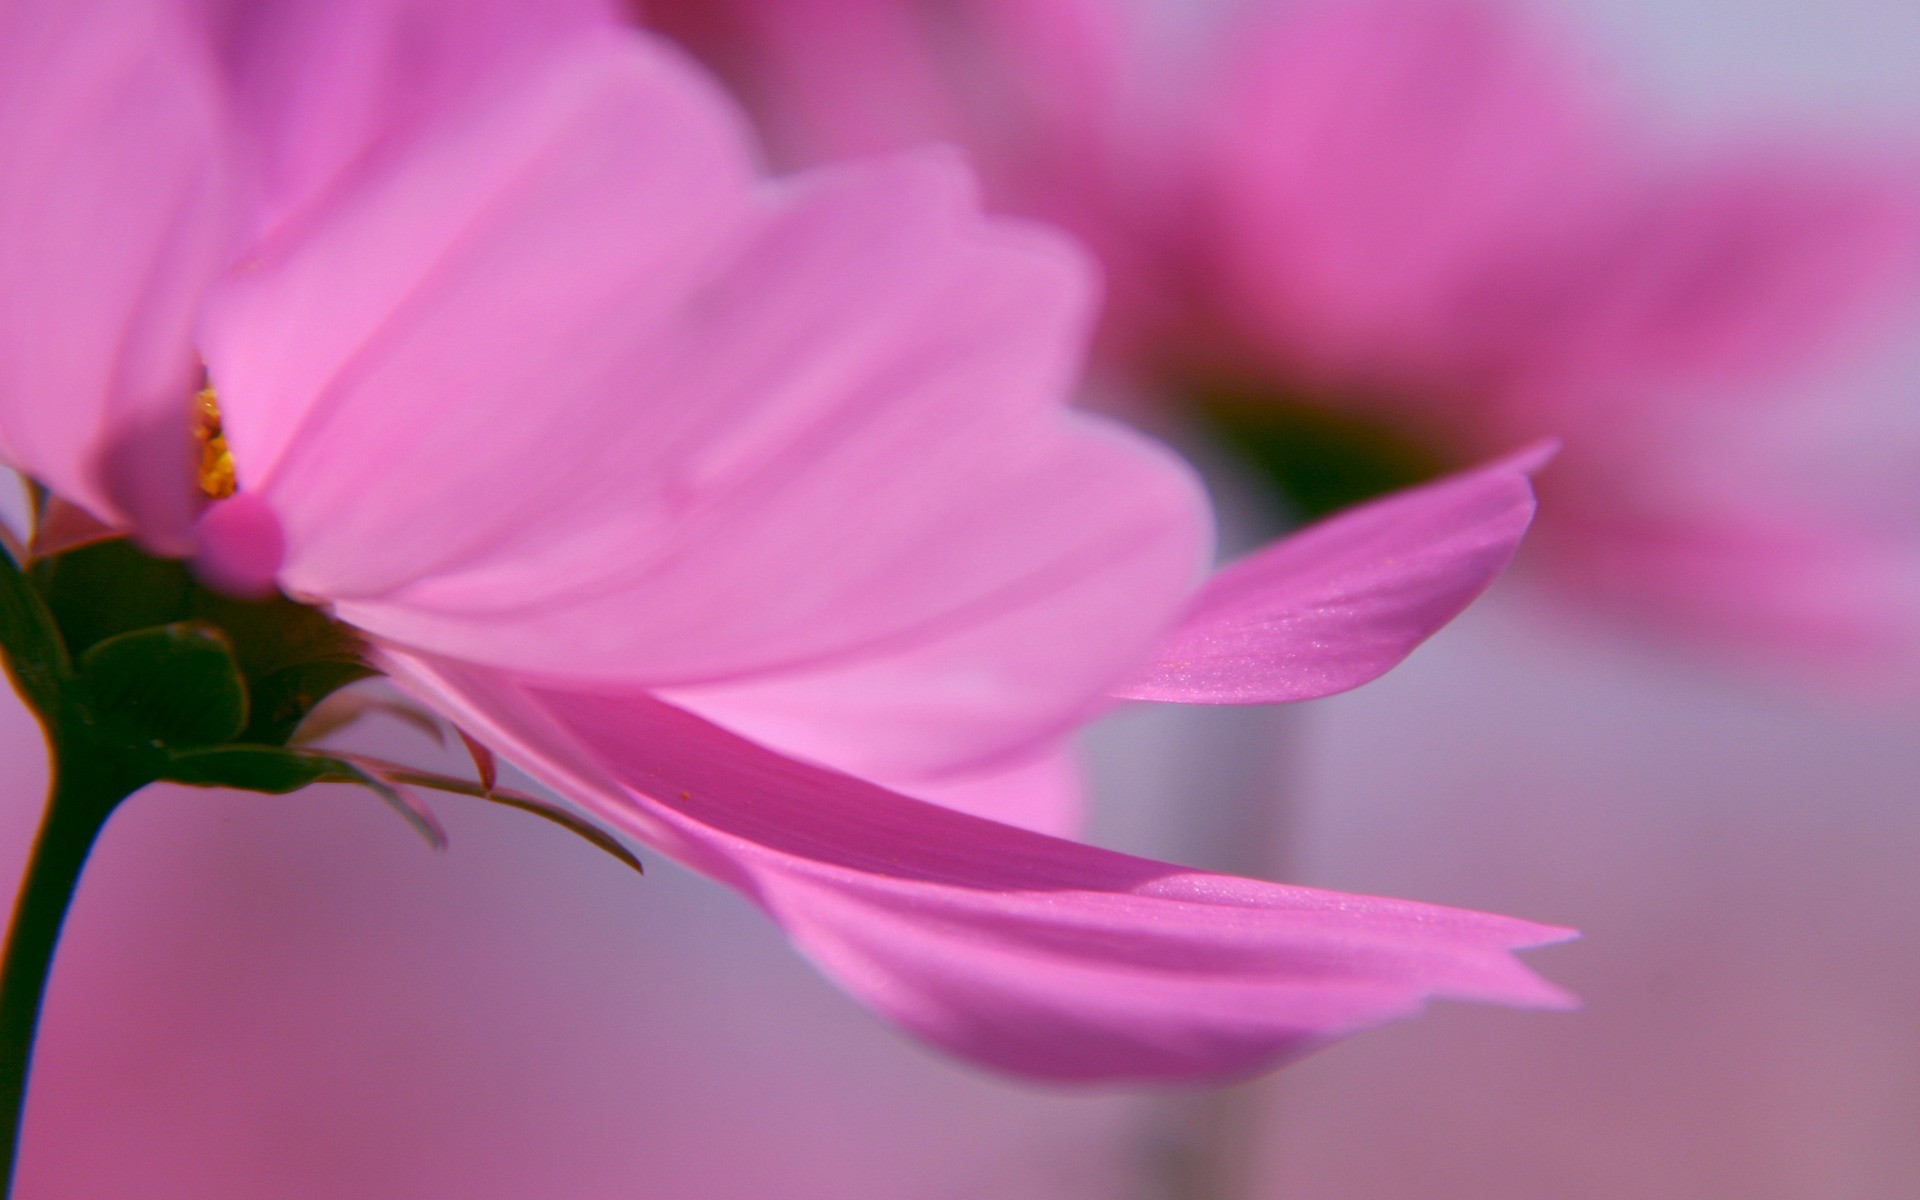 April 5, 2017 Pink Flowers | Resolution: 1920×1200, Dylan Sheldon